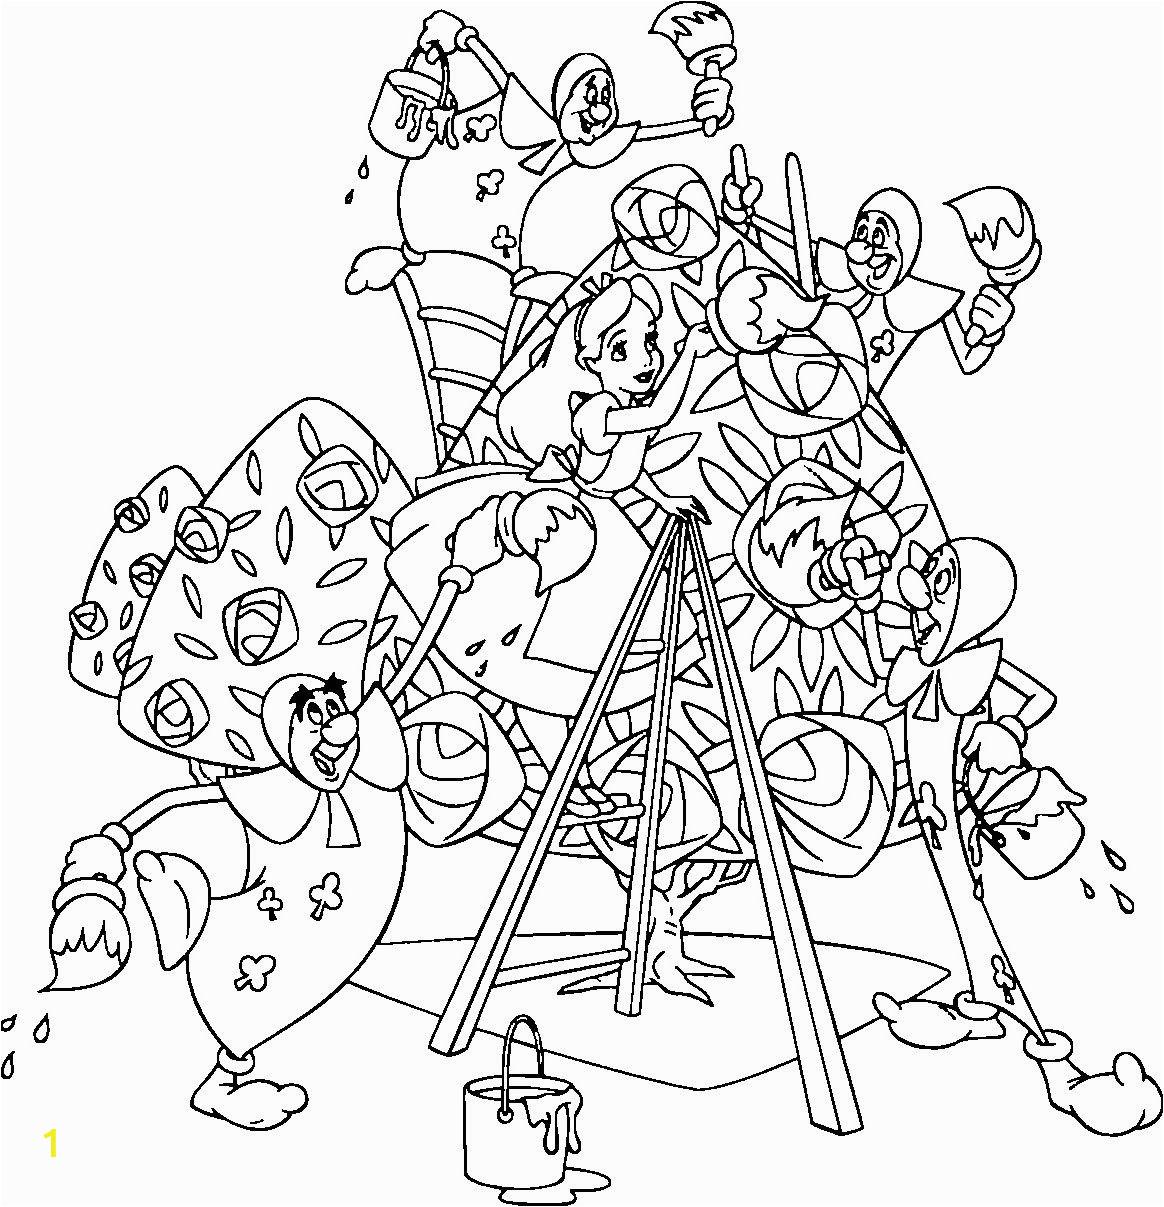 Disney Alice In Wonderland Coloring Pages Alice and Wonderland Club Cards Coloring Pages